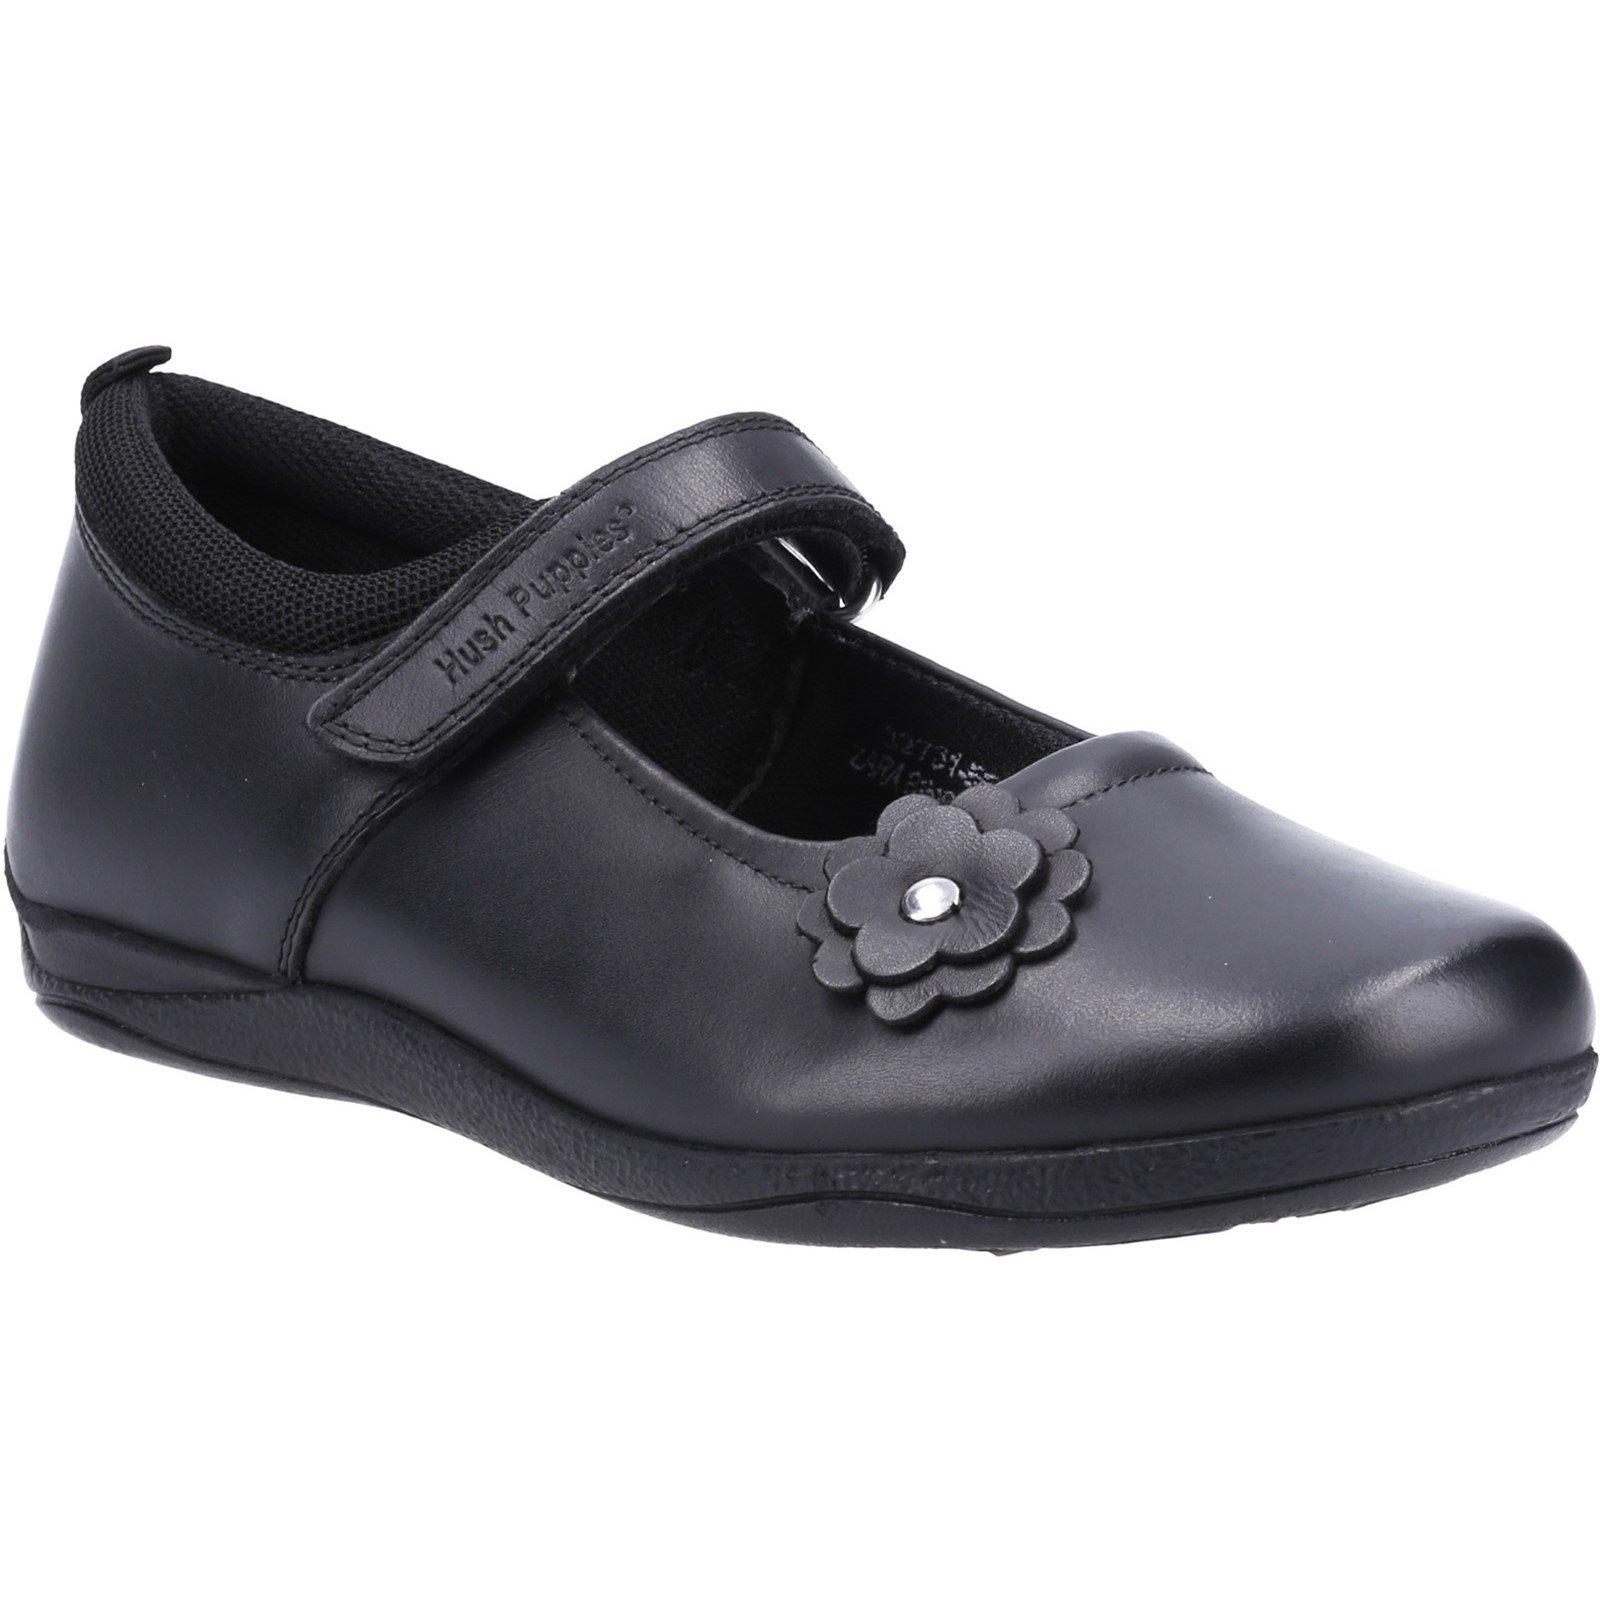 Hush Puppies Kid's Zara Junior School Flat Shoe Black 32731 - Black 2.5